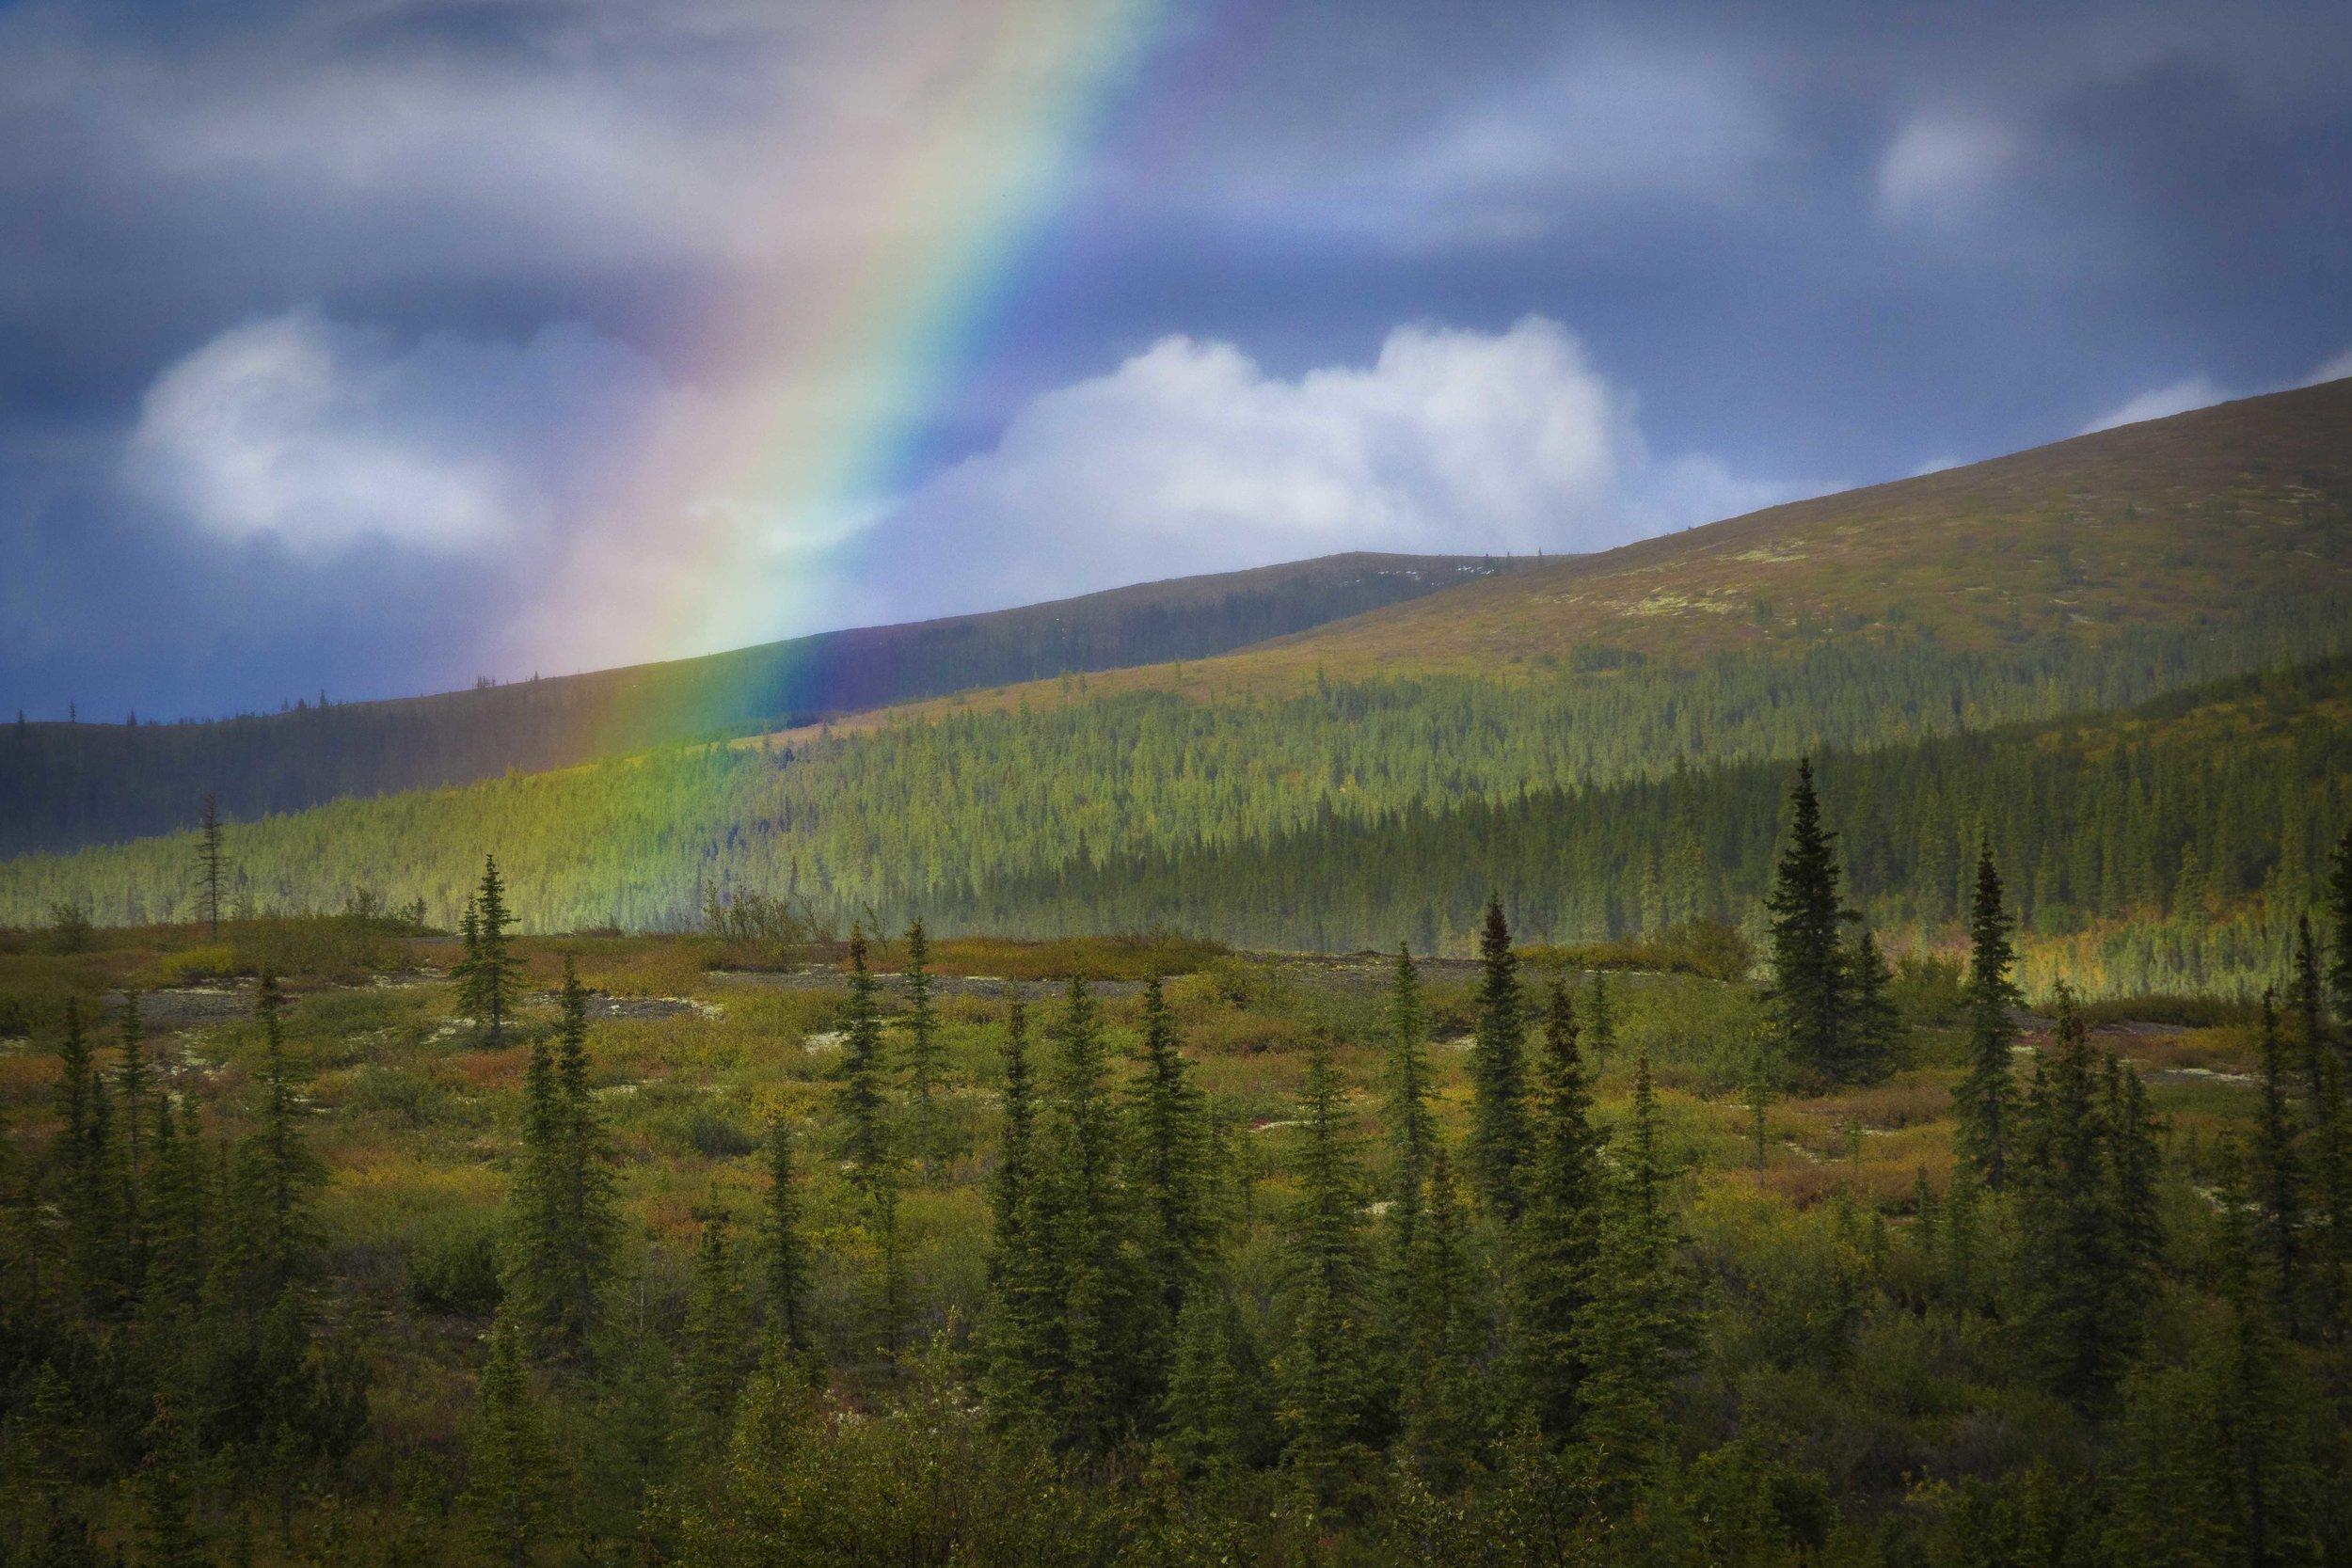 Dempster Highway, Roadtrip, Landscape, Arctic, rob gubiani, Tundra, Tombstone, Tuktoyuktuk, Inuvik, Dempster, Yukon, travel, wanderlust, boreal, forest, boreal forest, fall, autumn, rainbow,